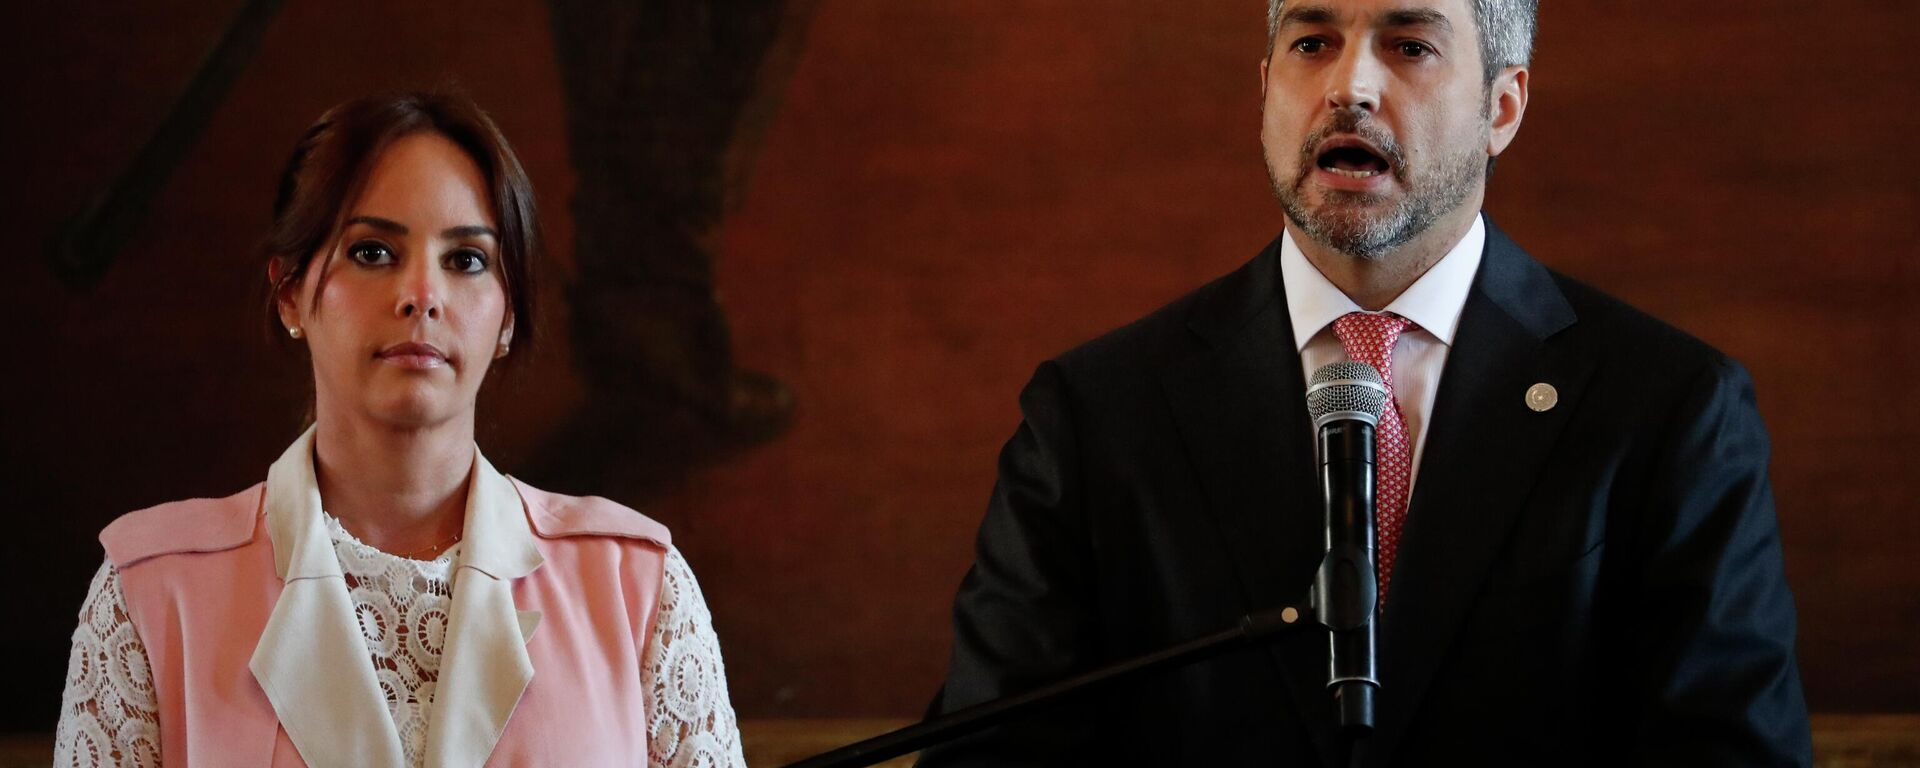 Mario Abdo Benitez, presidente de Paraguay, y Silvana  Abdo, primera dama (archivo) - Sputnik Mundo, 1920, 09.07.2021